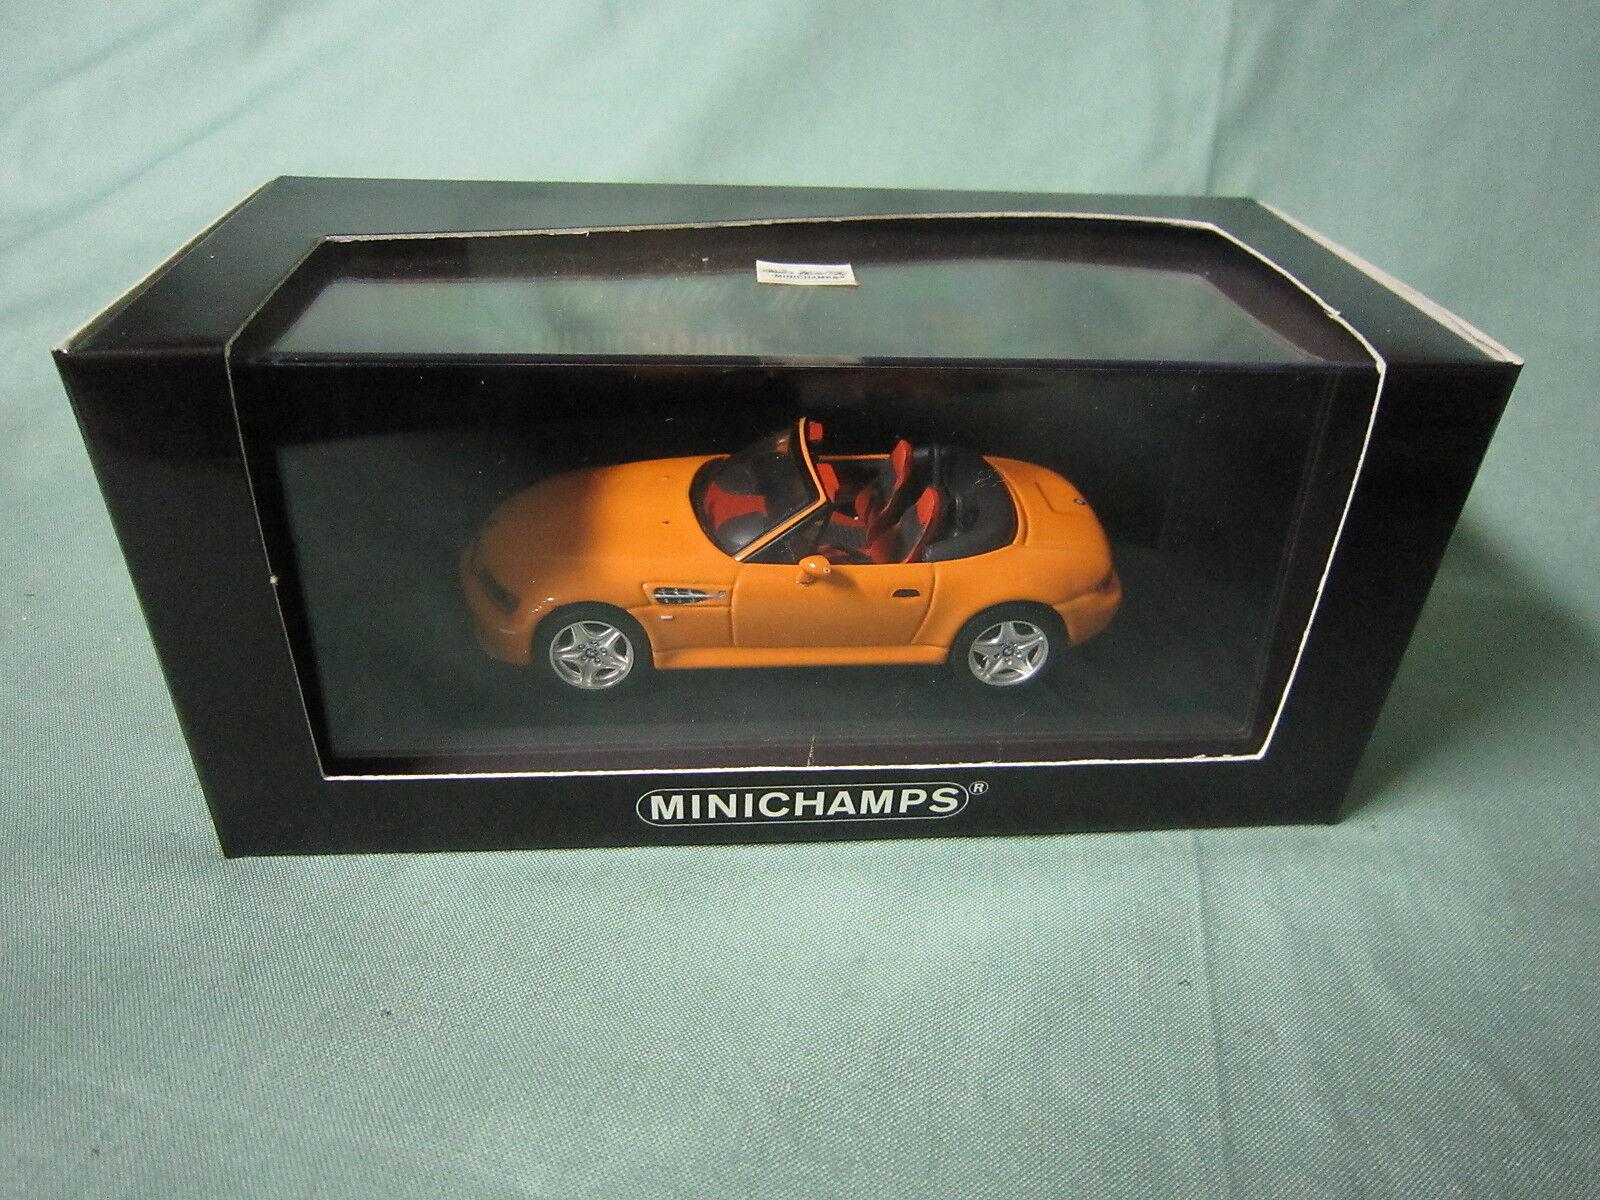 DV4899 DV4899 DV4899 MINICHAMPS BMW M ROADSTER 1997 Ref 430024360 1 43 NB 68155b